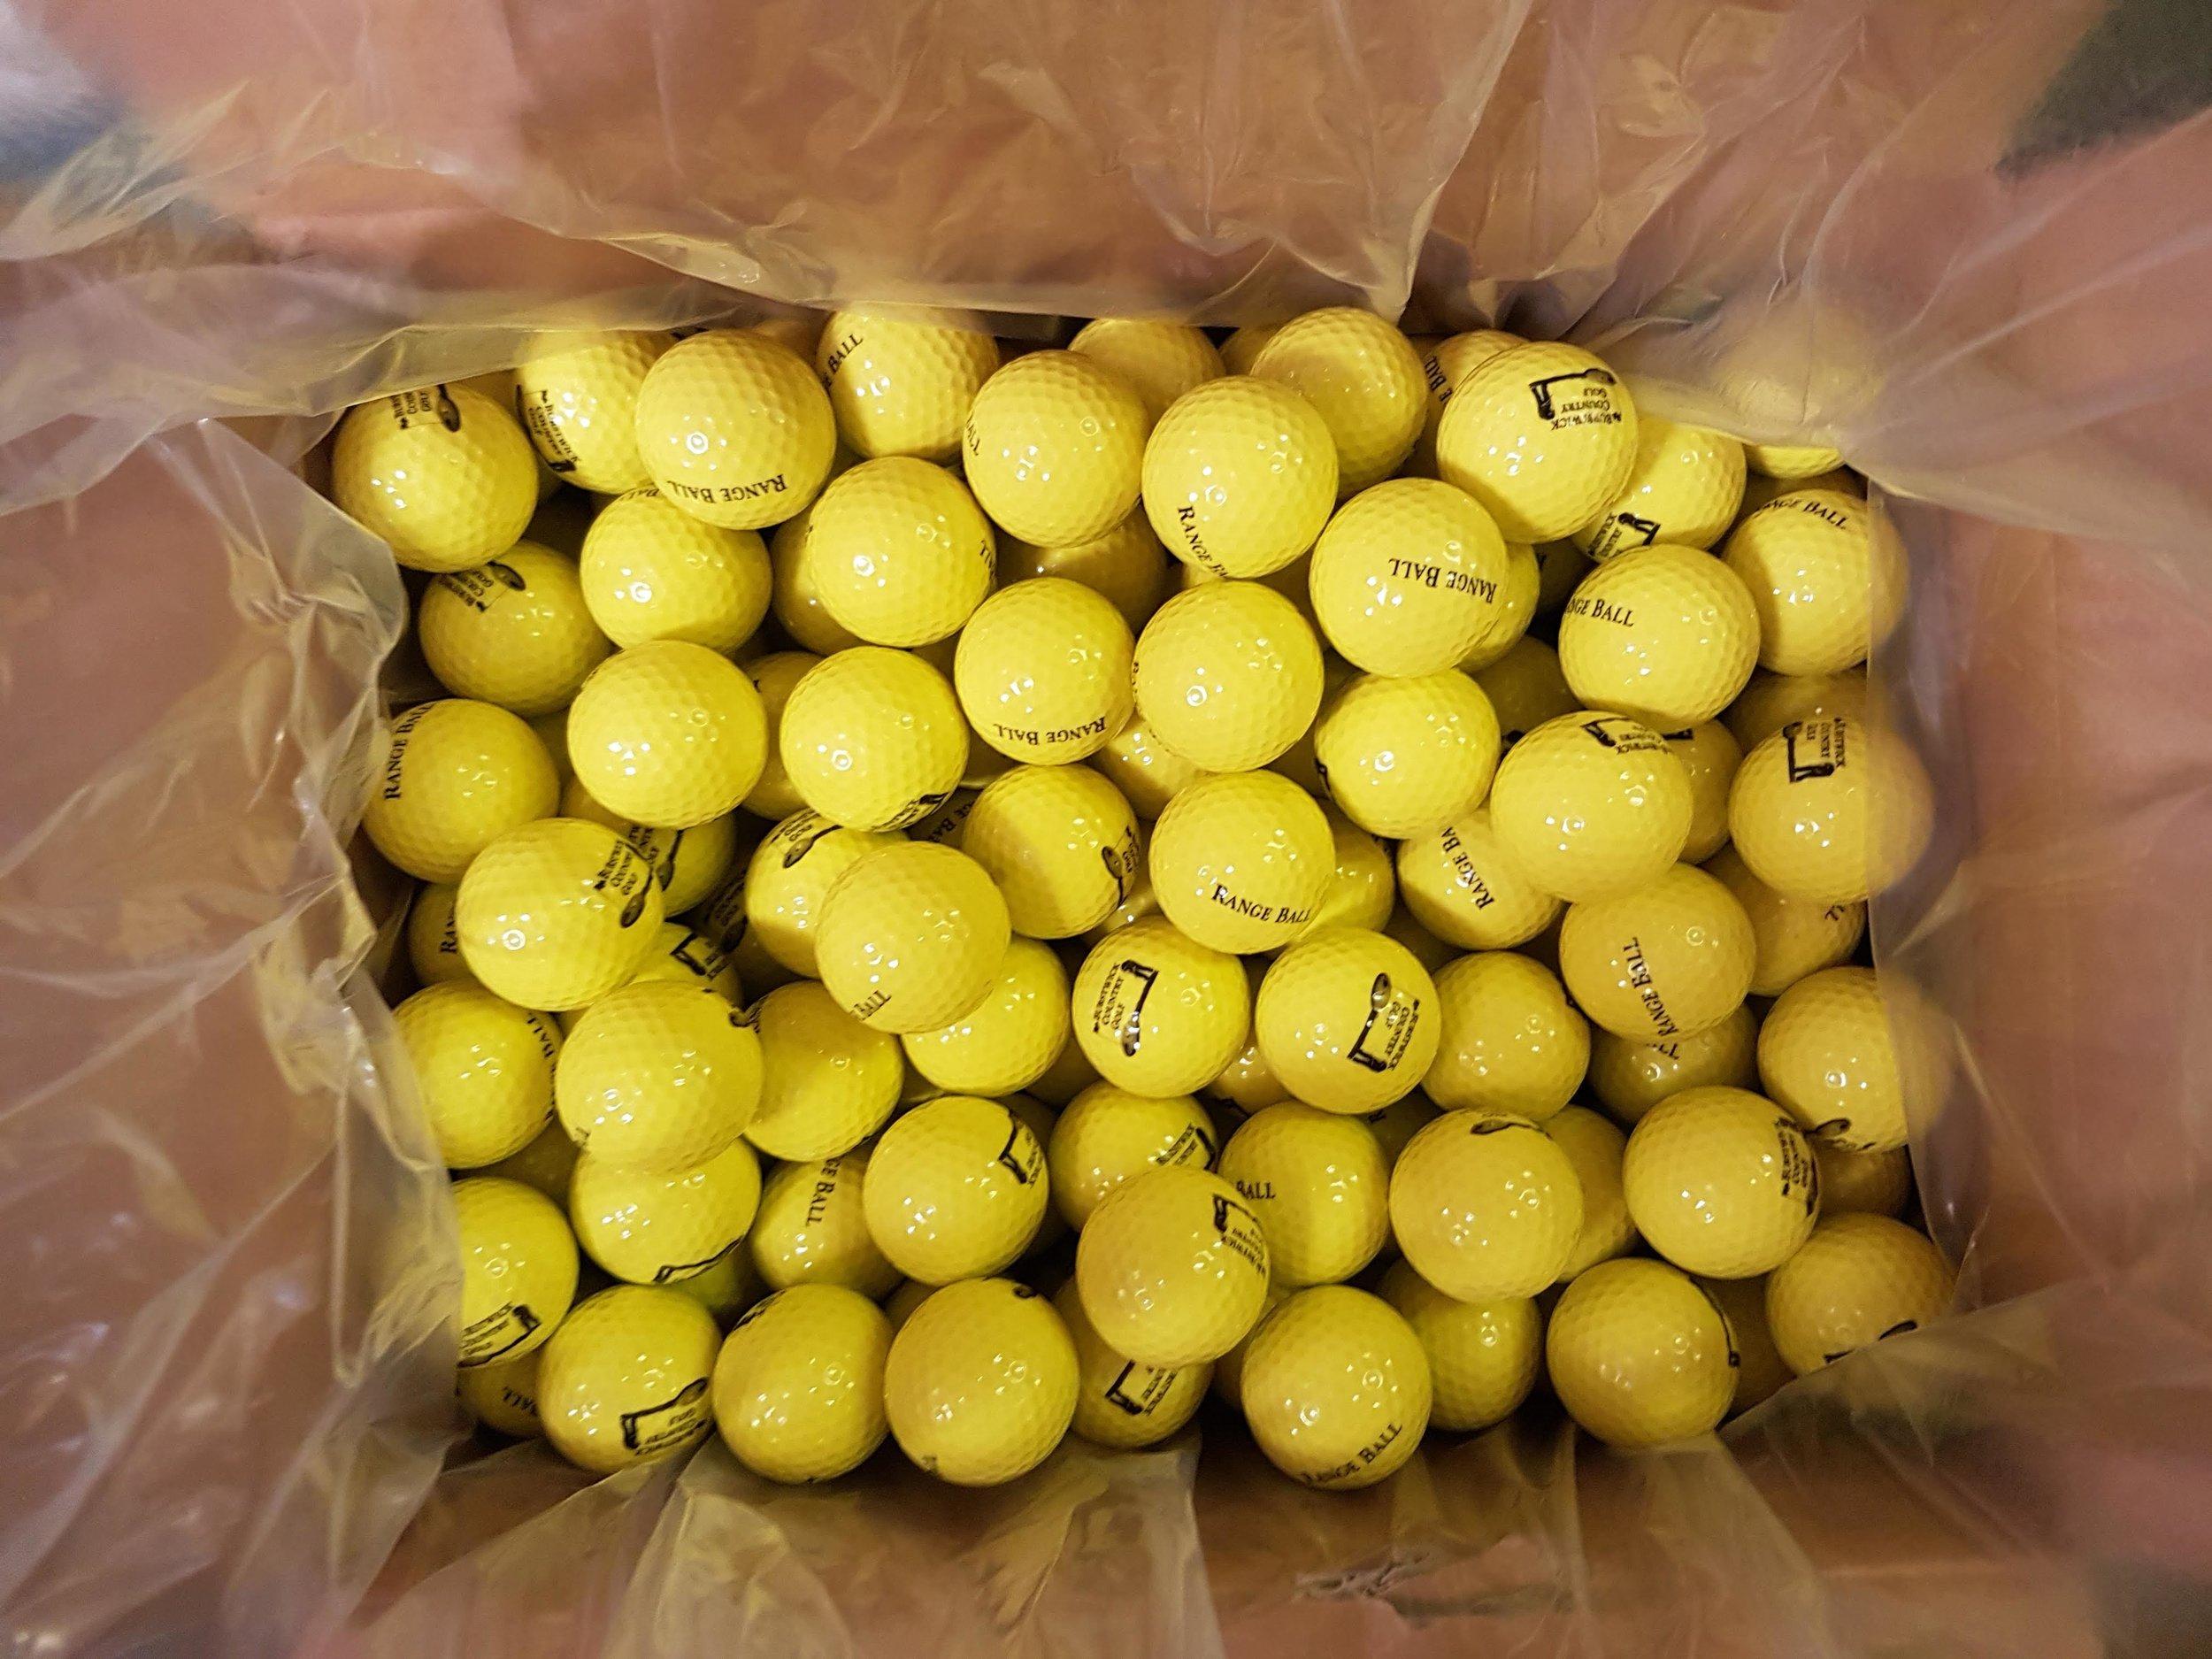 12,000 New driving range balls